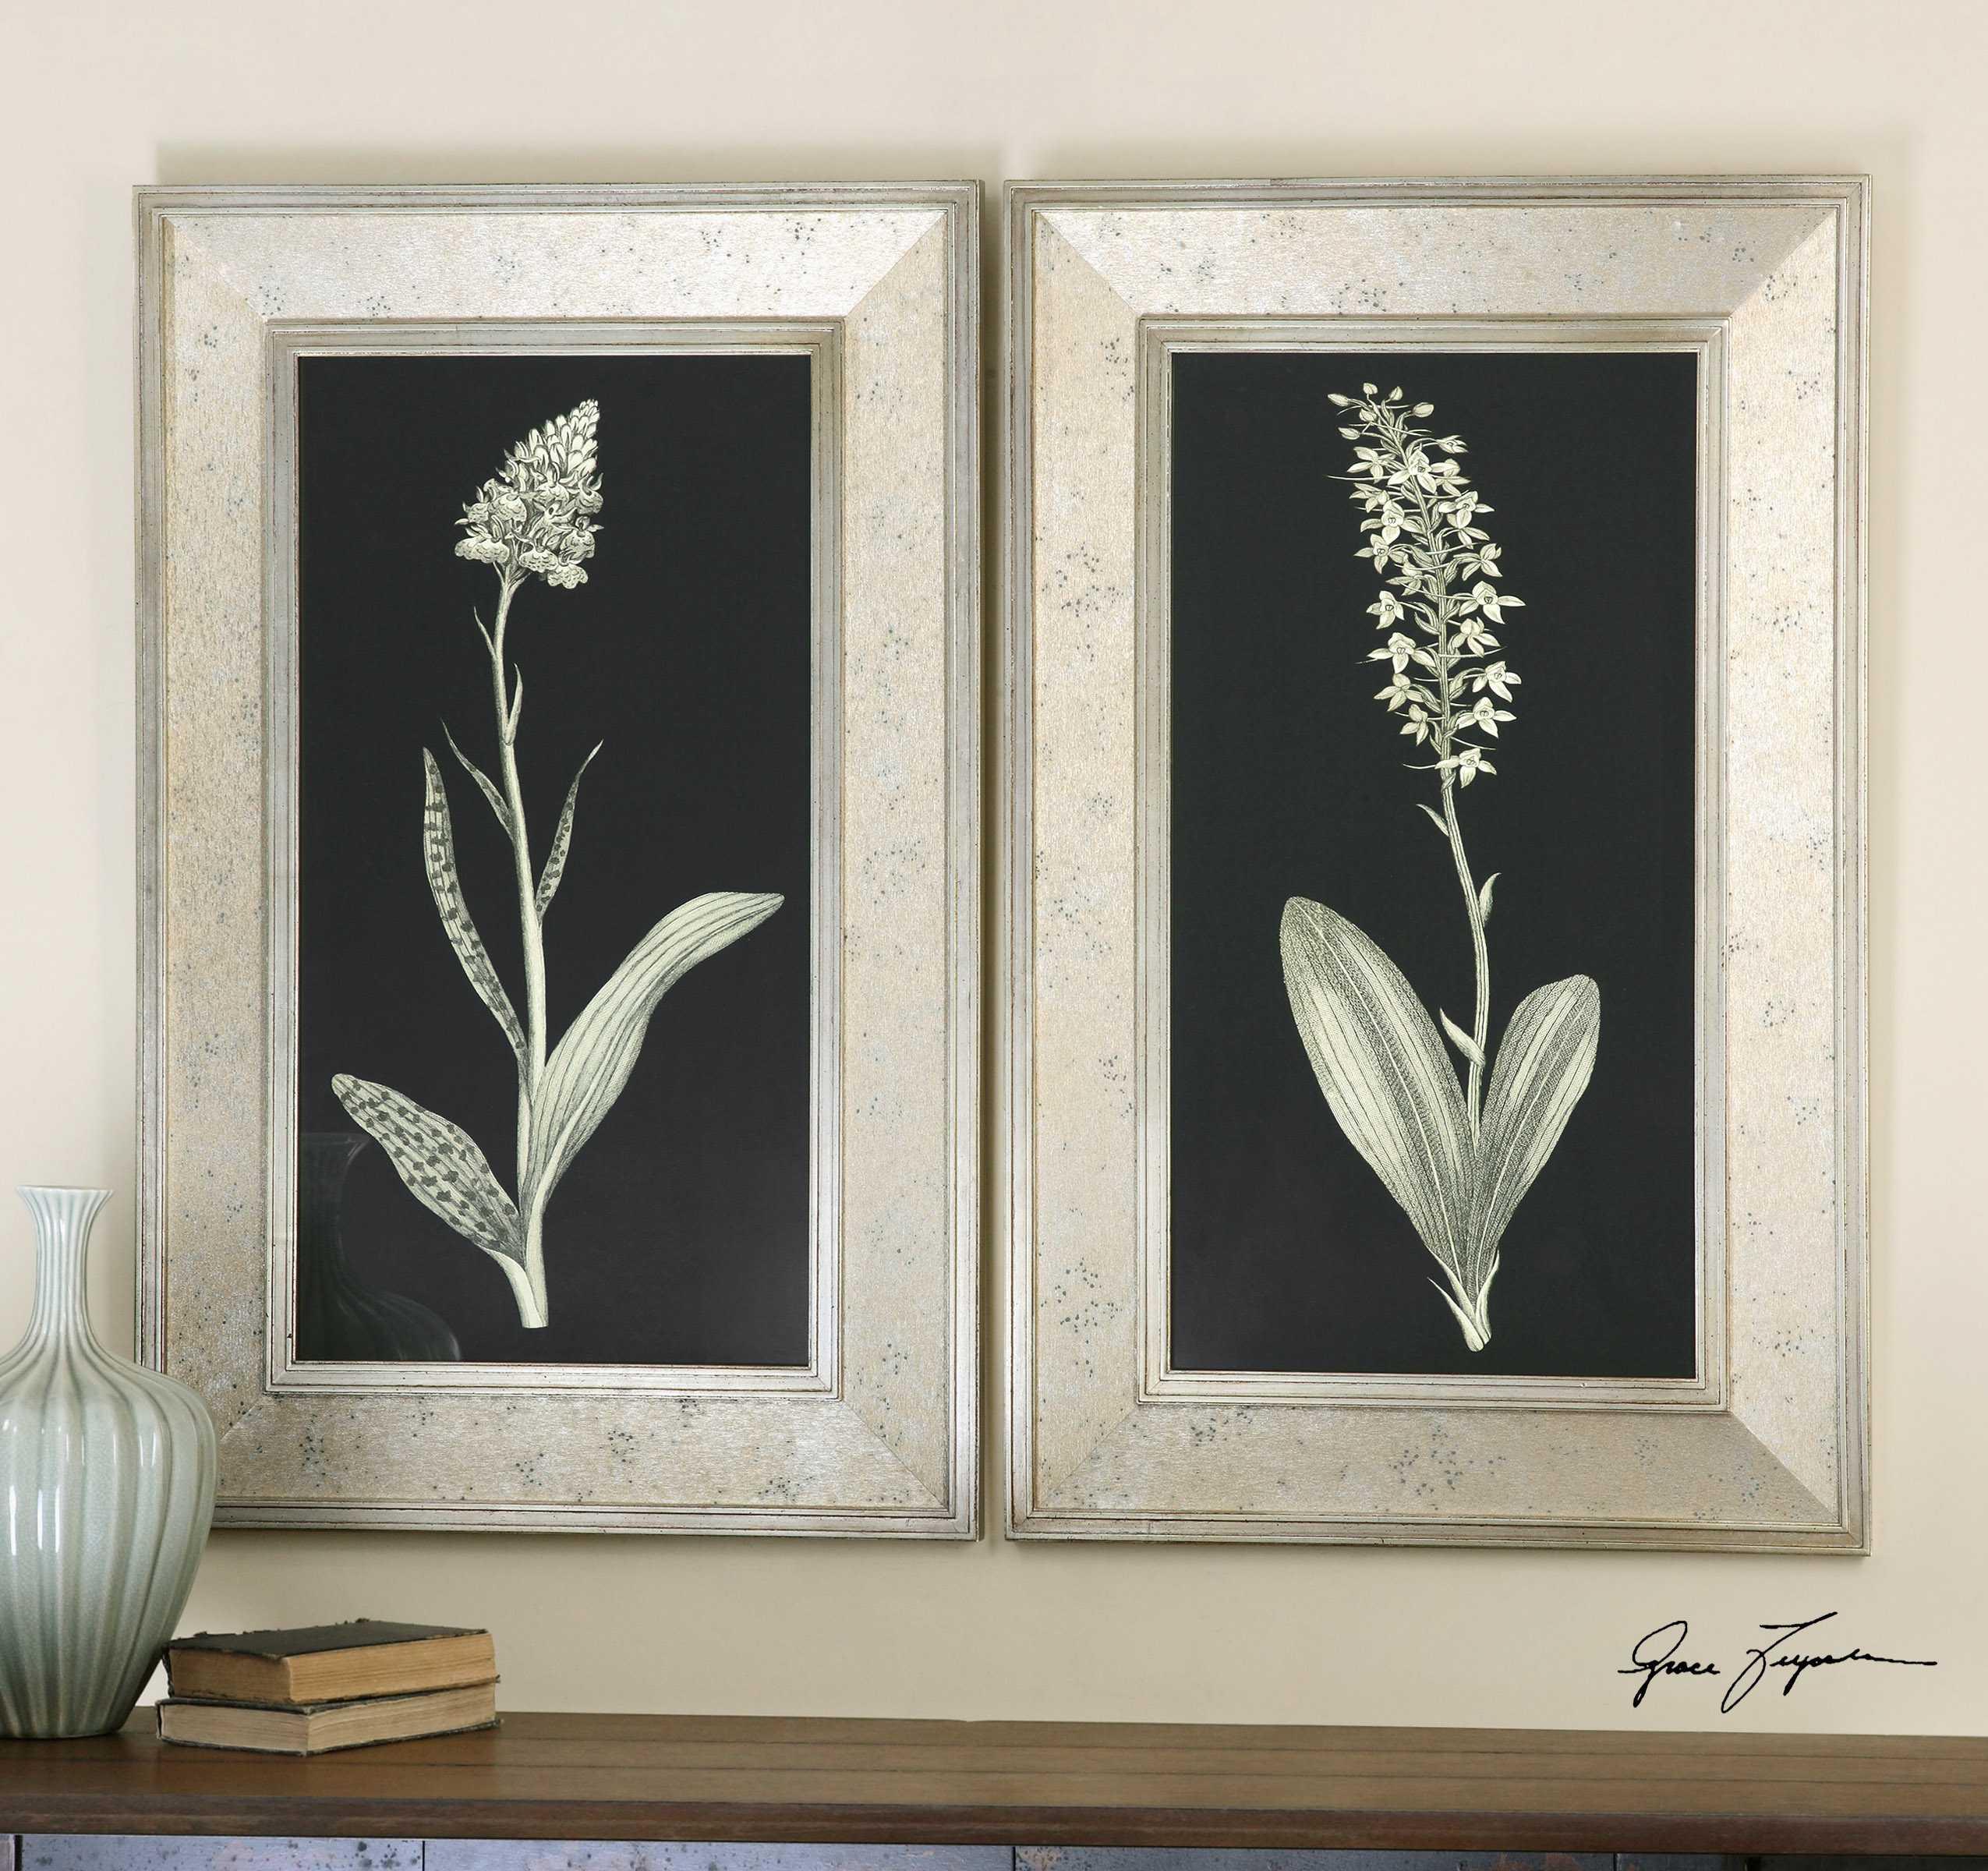 Uttermost Antique Floral Study Framed Wall Art 2 Piece